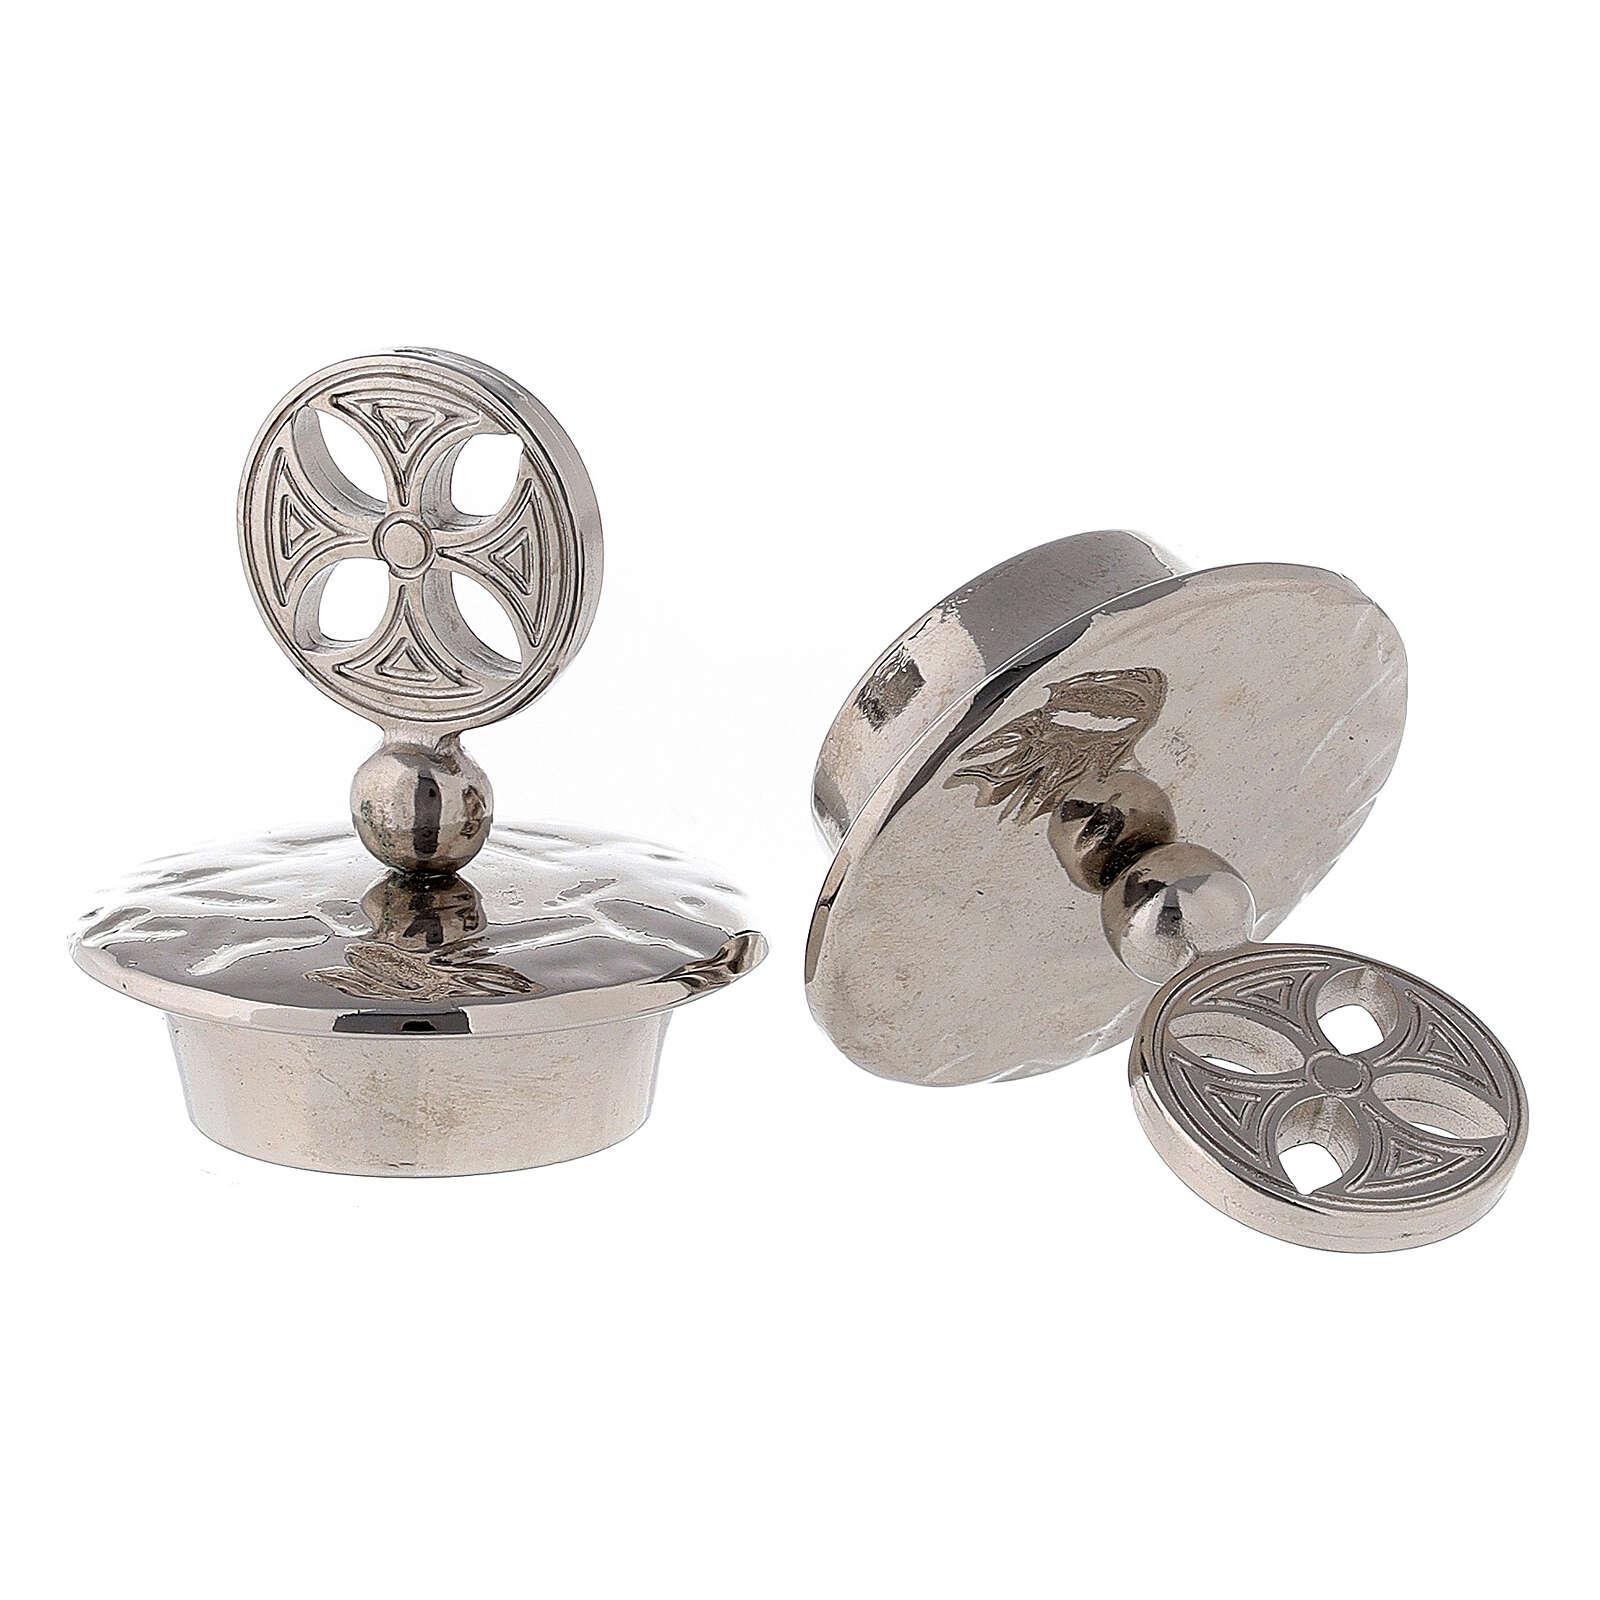 Pair of caps for round cross Venezia-Roma model jugs 4